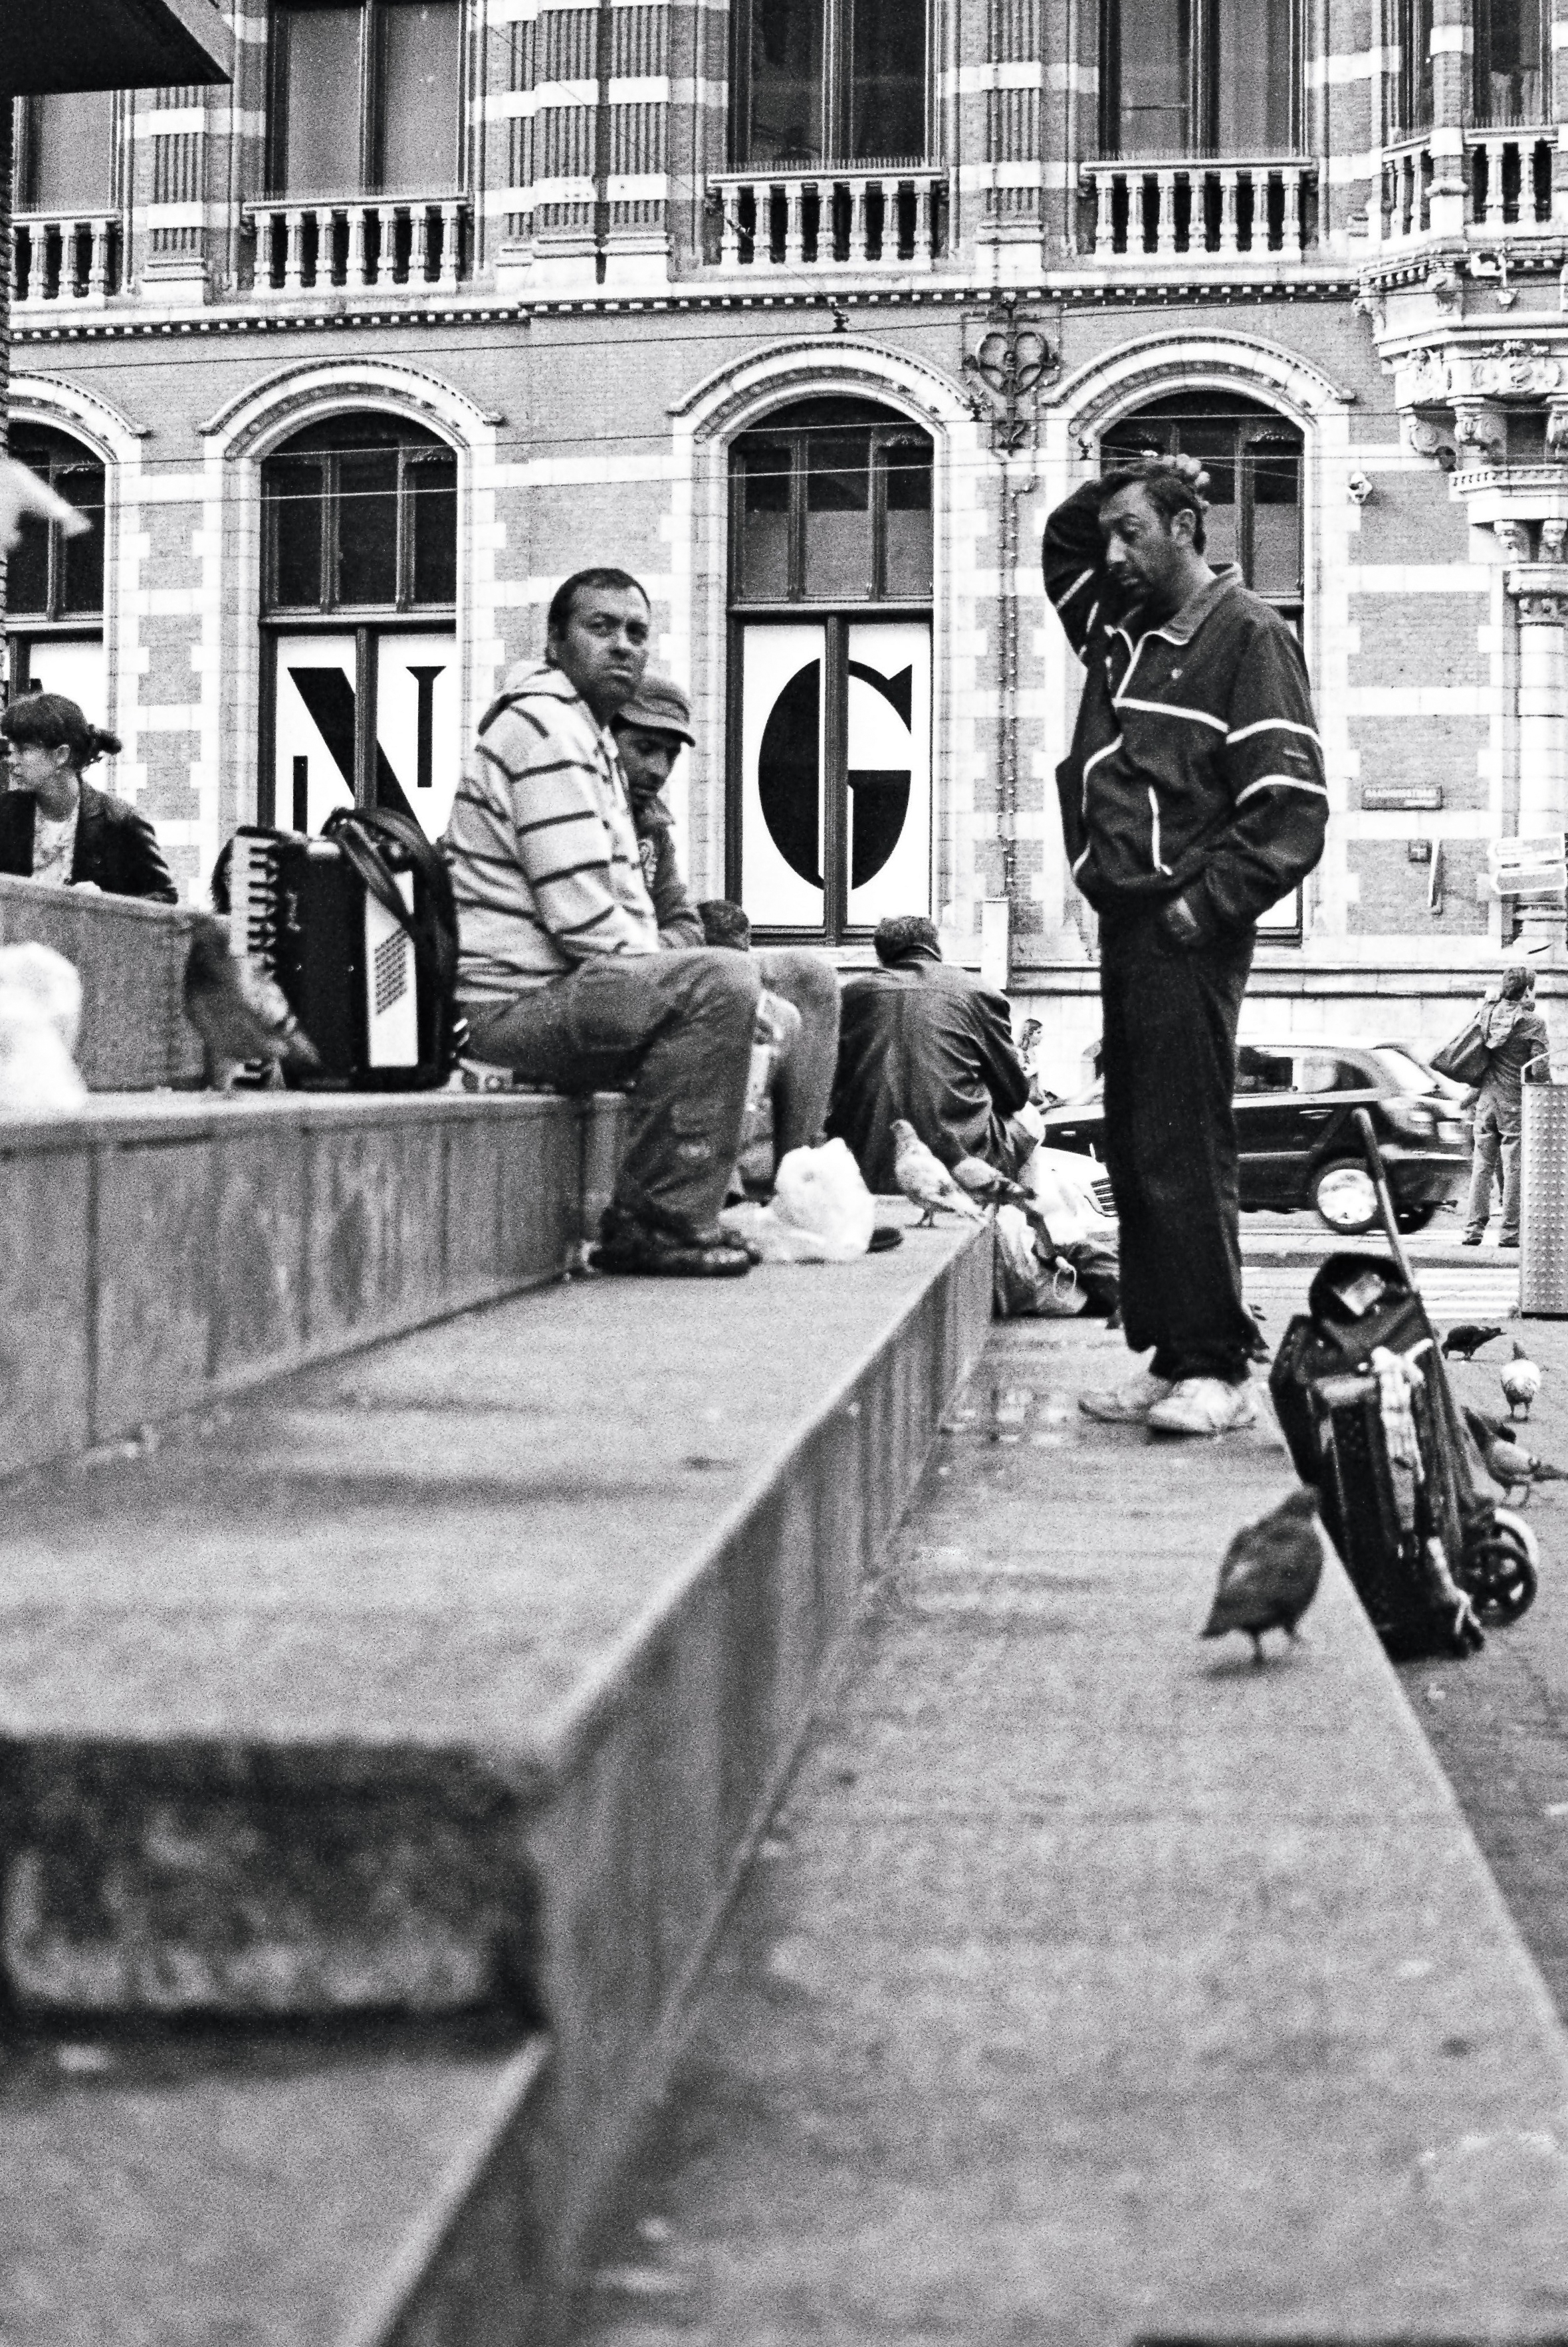 Musician, Amsterdam, Netherlands, Europe